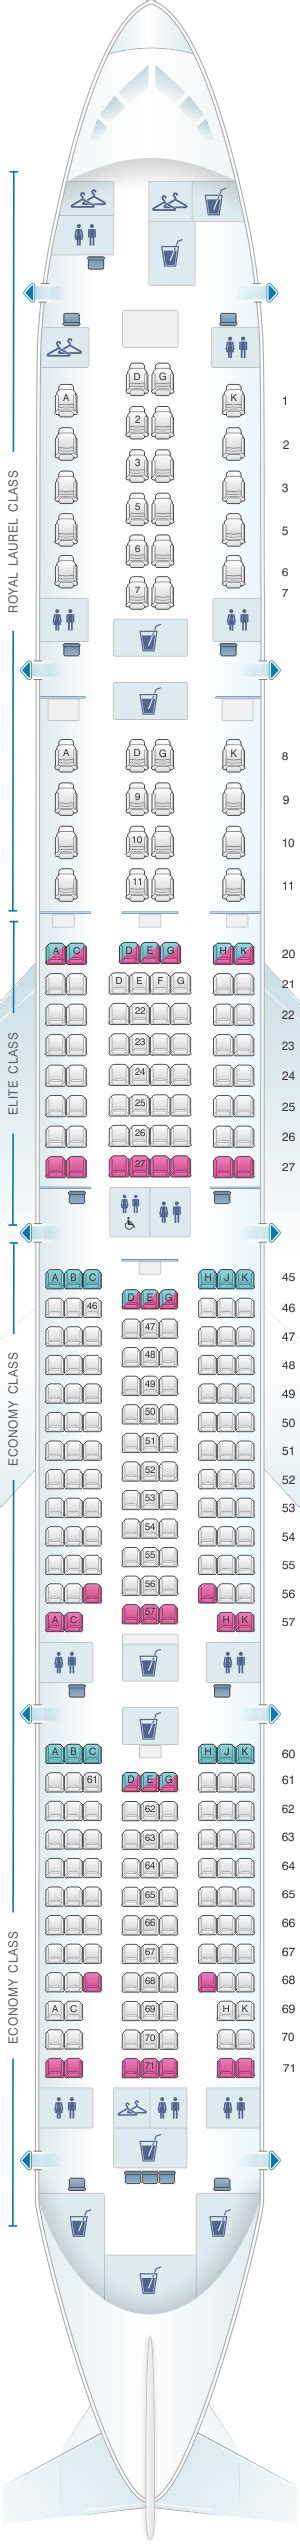 plan si es boeing 777 300er air seat map air boeing b777 300er 313pax seatmaestro